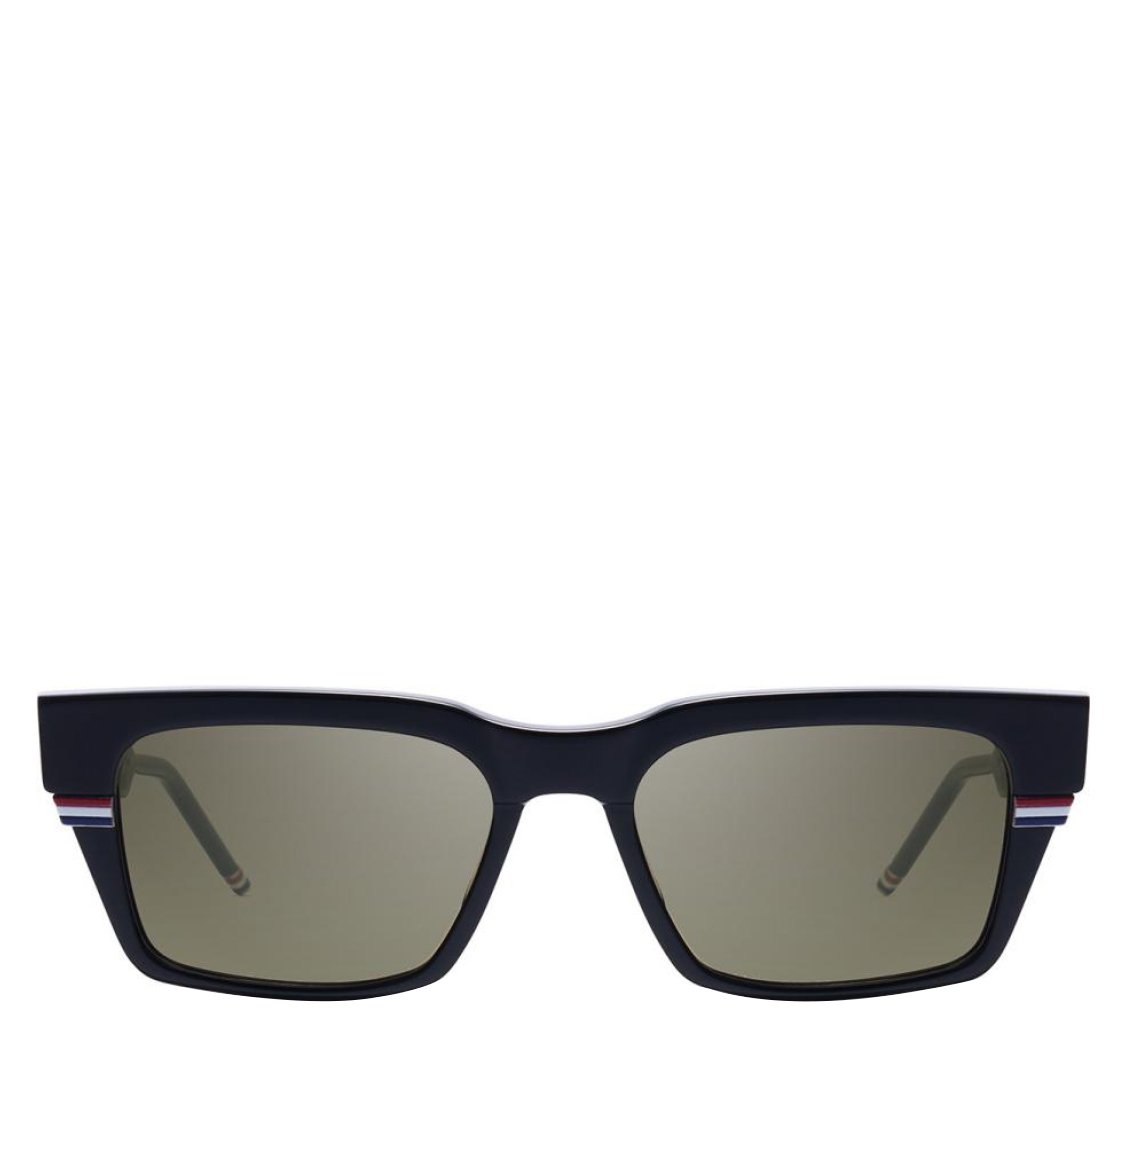 Thom Browne Square Frame Black Sunglasses Γυαλιά Ηλίου